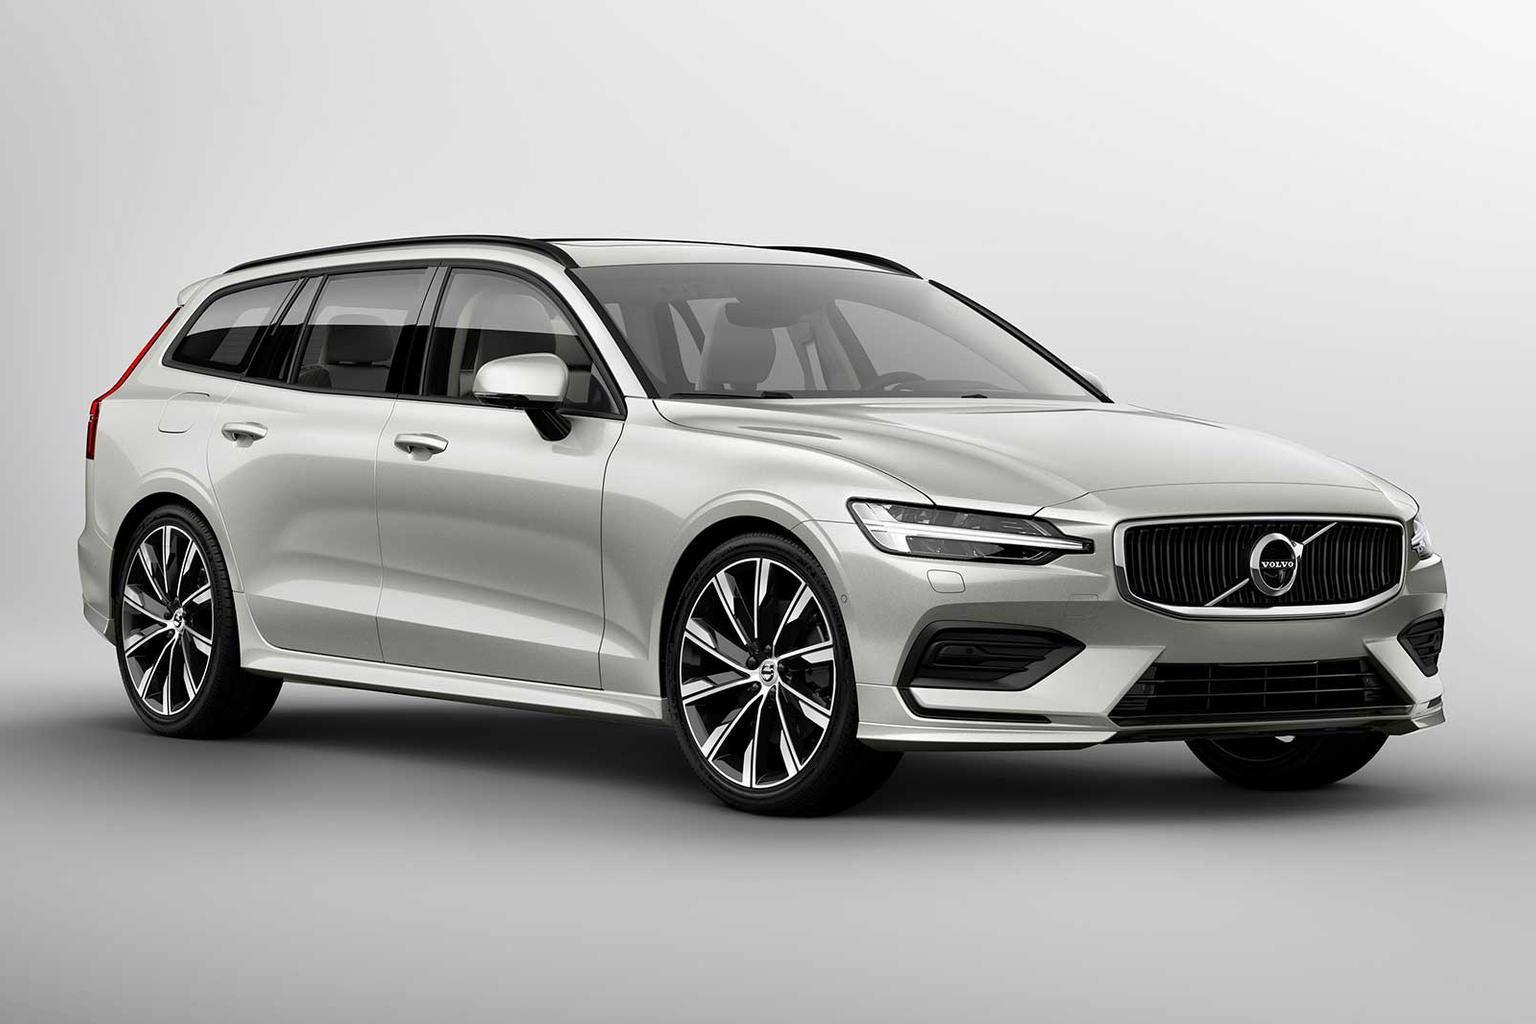 2018 Volvo V60 exclusive Reader Test Team preview